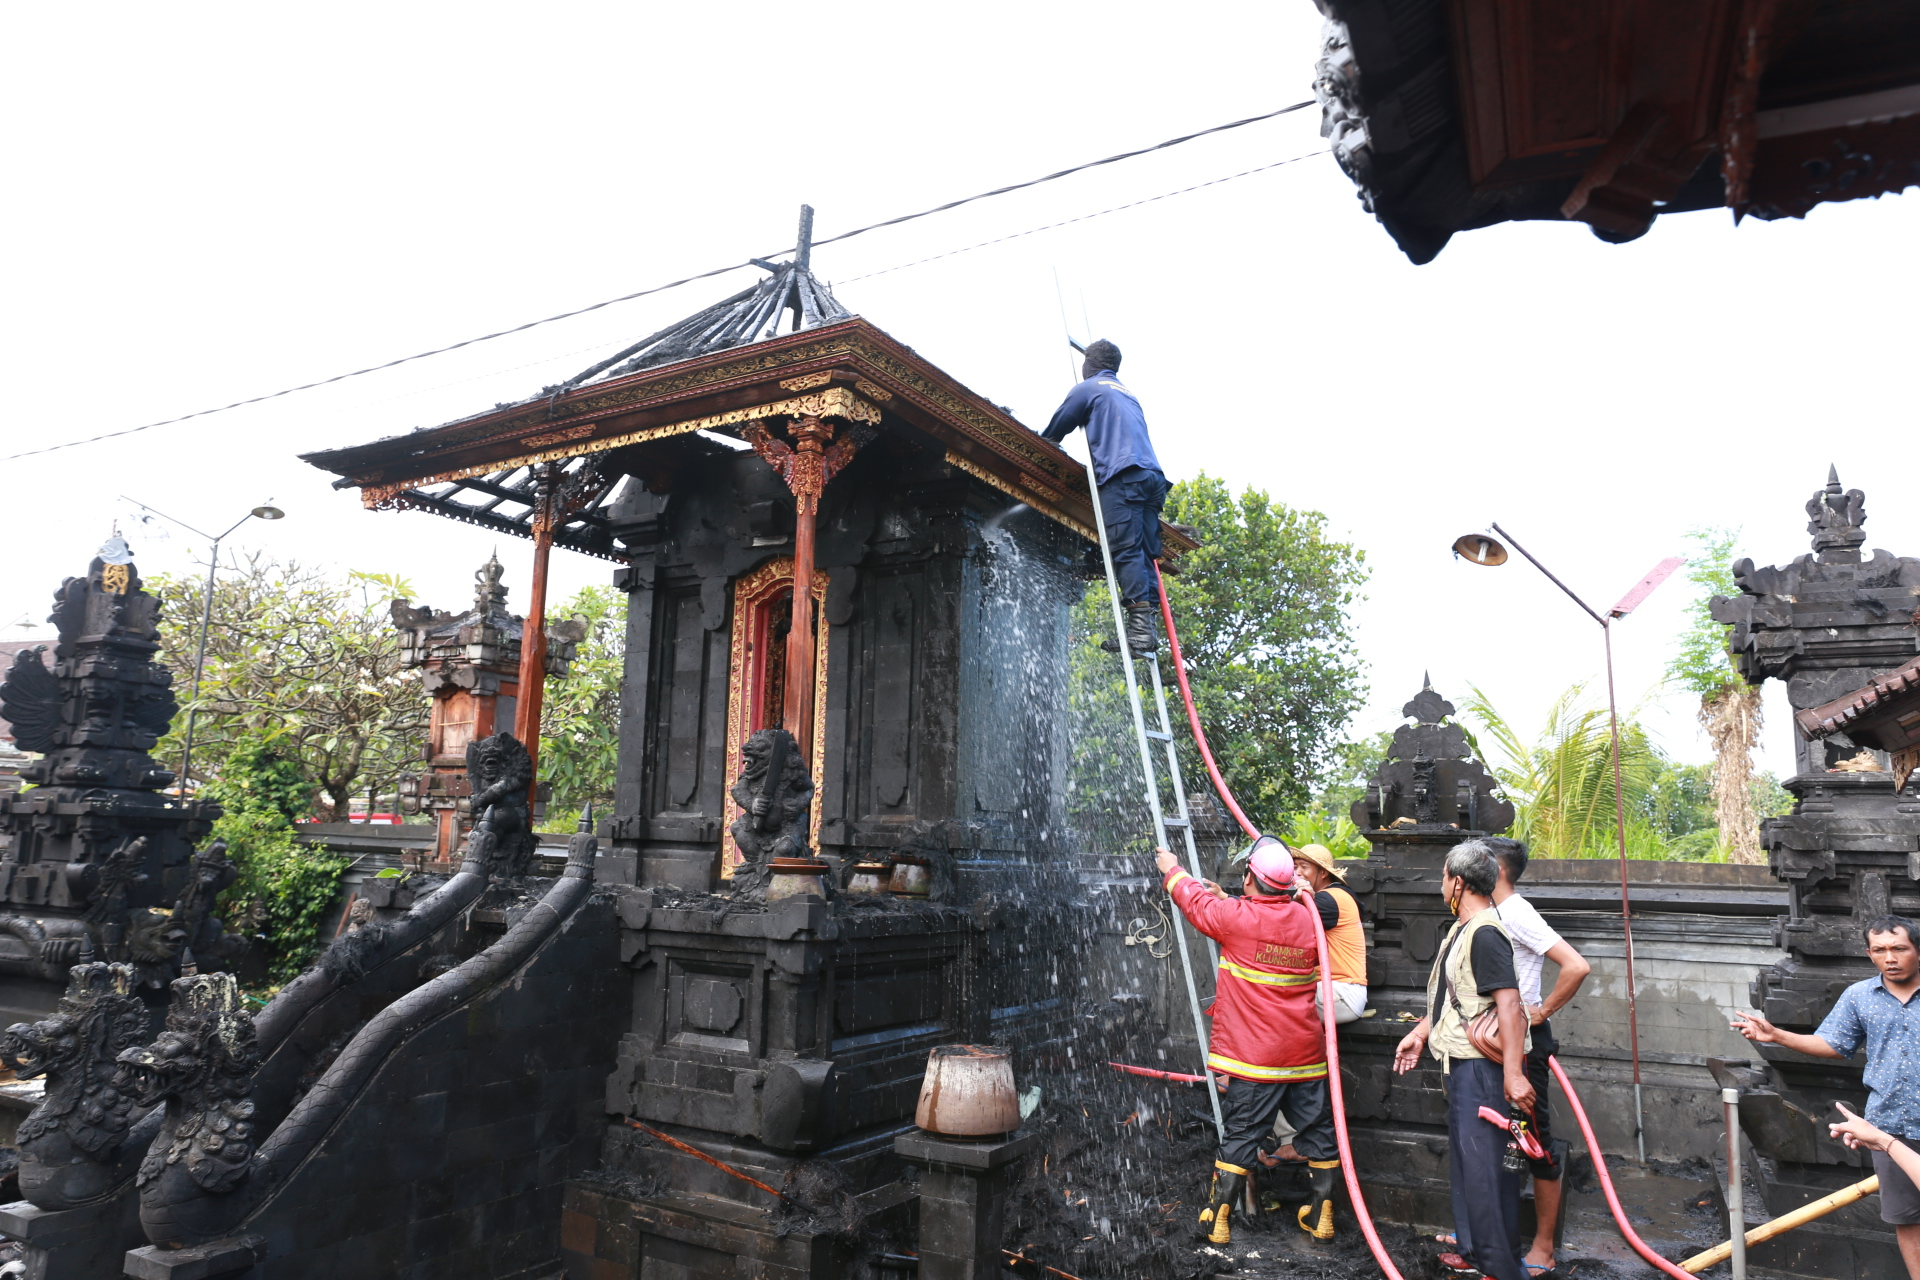 Foto: Kebakaran di klungkung PETUGAS pemadam kebakaran memadamkan api yang menghanguskan Gedong Penyimpenan Pura Dalem Setra, Dusun Sidayu Tojan, Desa Takmung, Banjarangkan, Selasa (1/9). Foto: ist